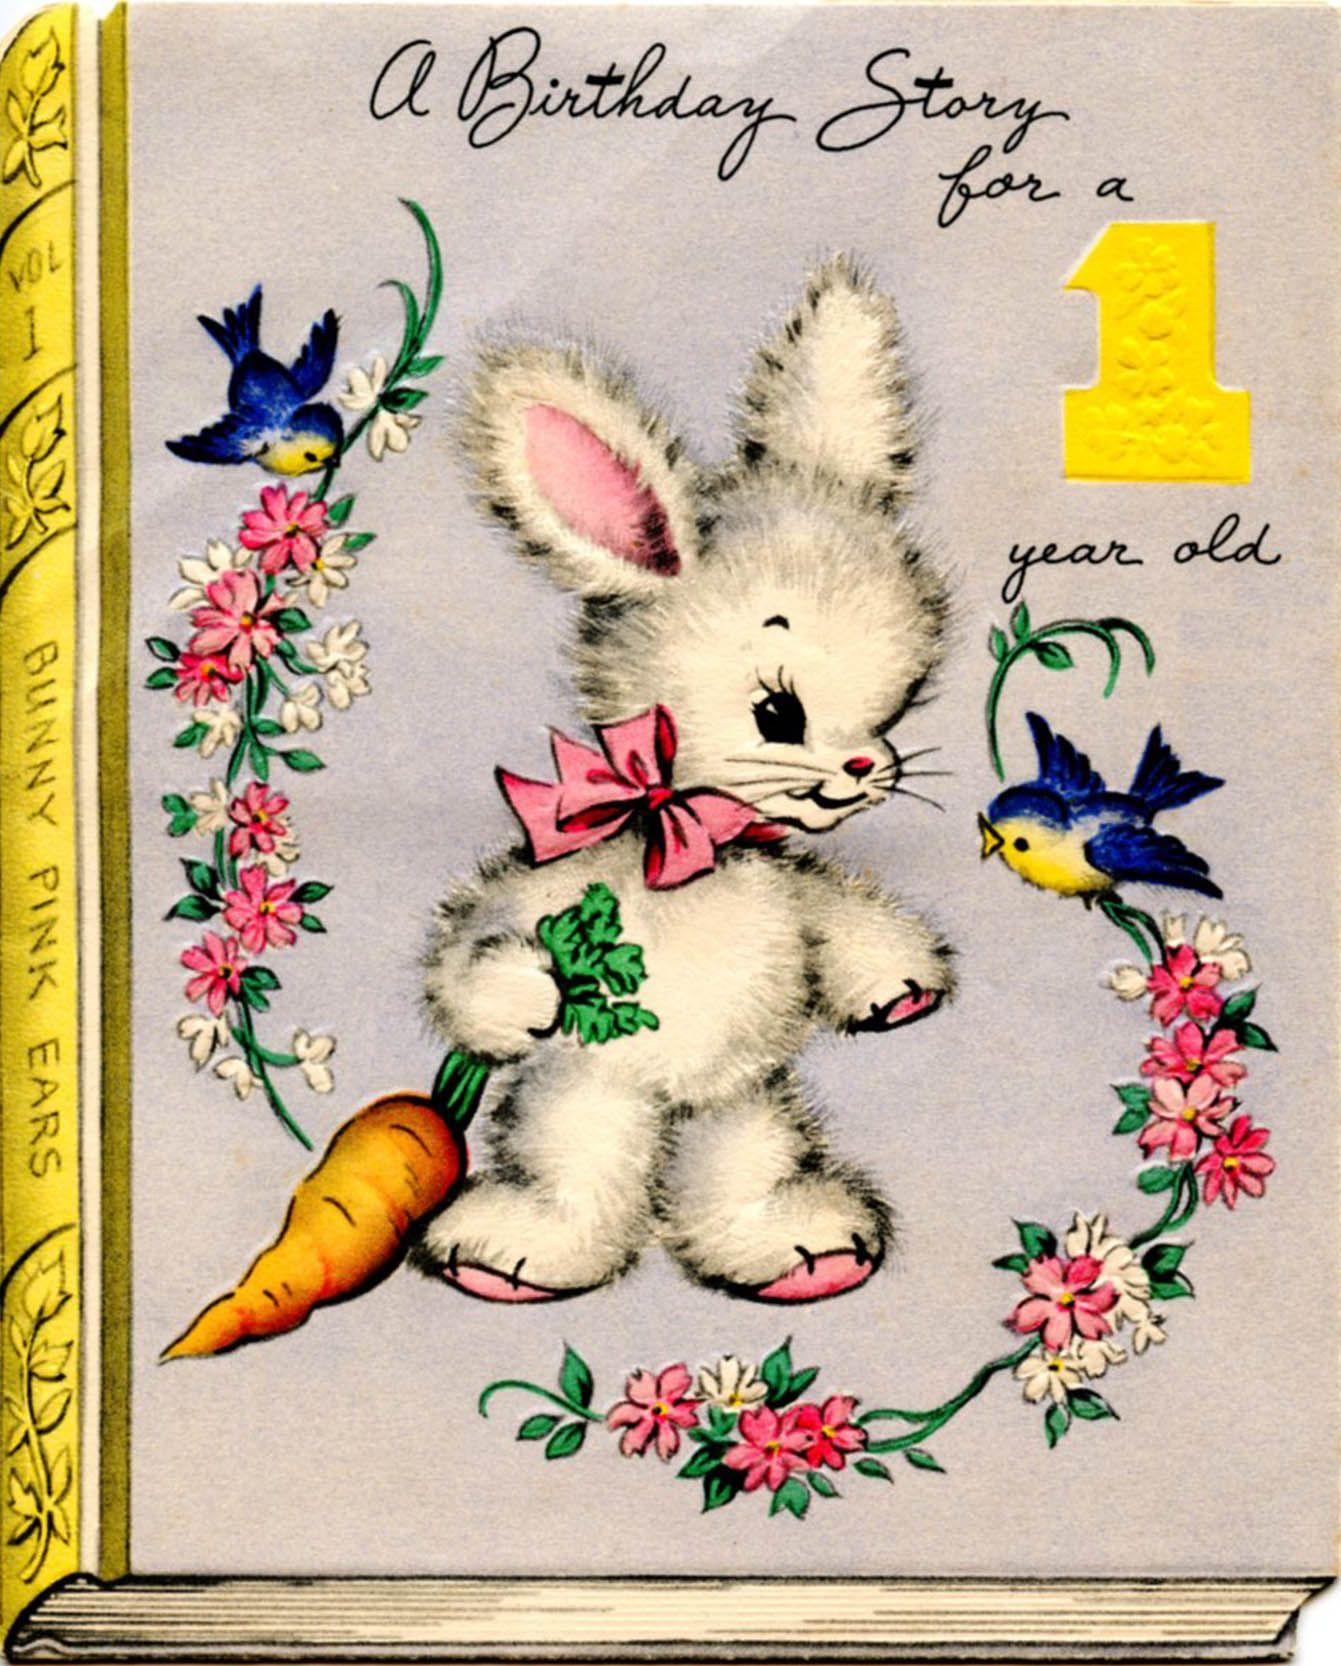 1948 Greetings Inc U.S.A. 1st Birthday Card